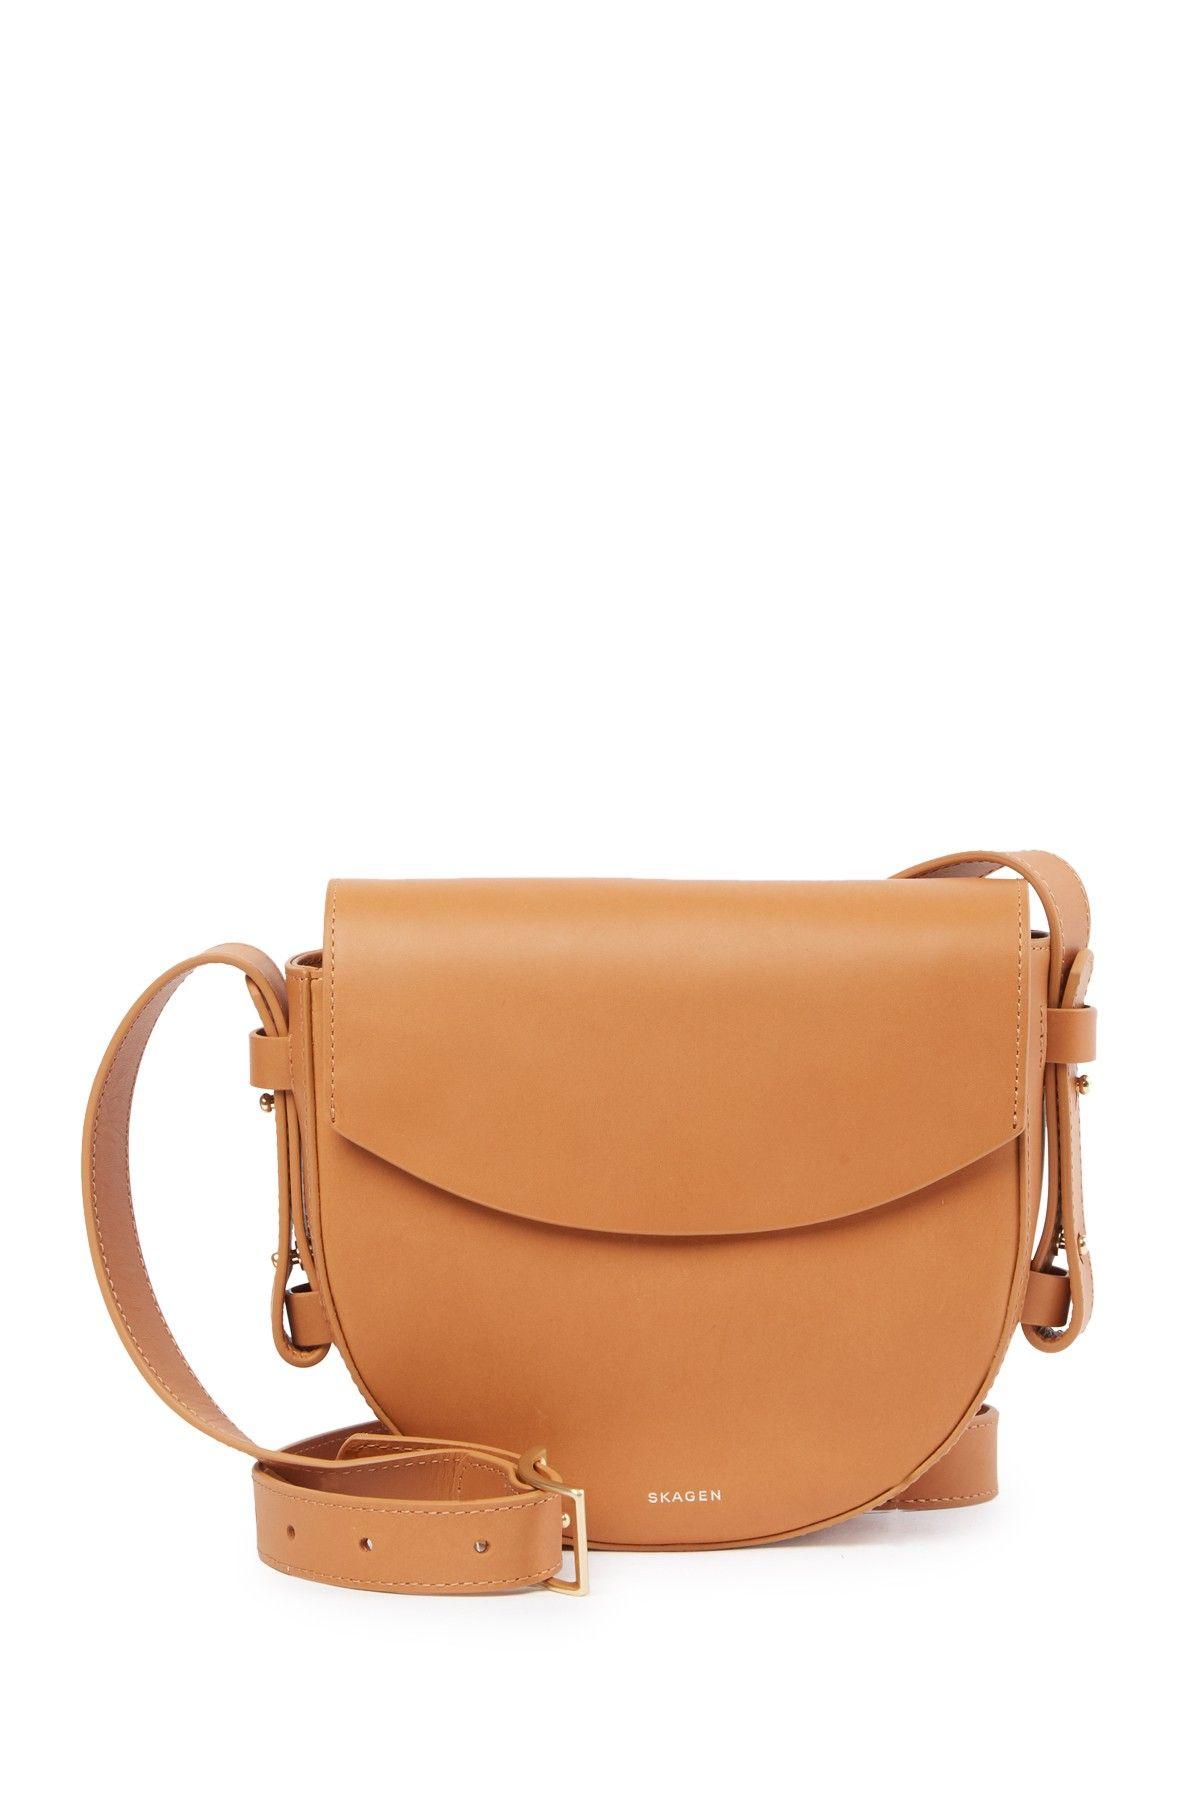 50ac628b65c5 Skagen   Lobelle Leather Saddle Crossbody Bag   deals and steals ...